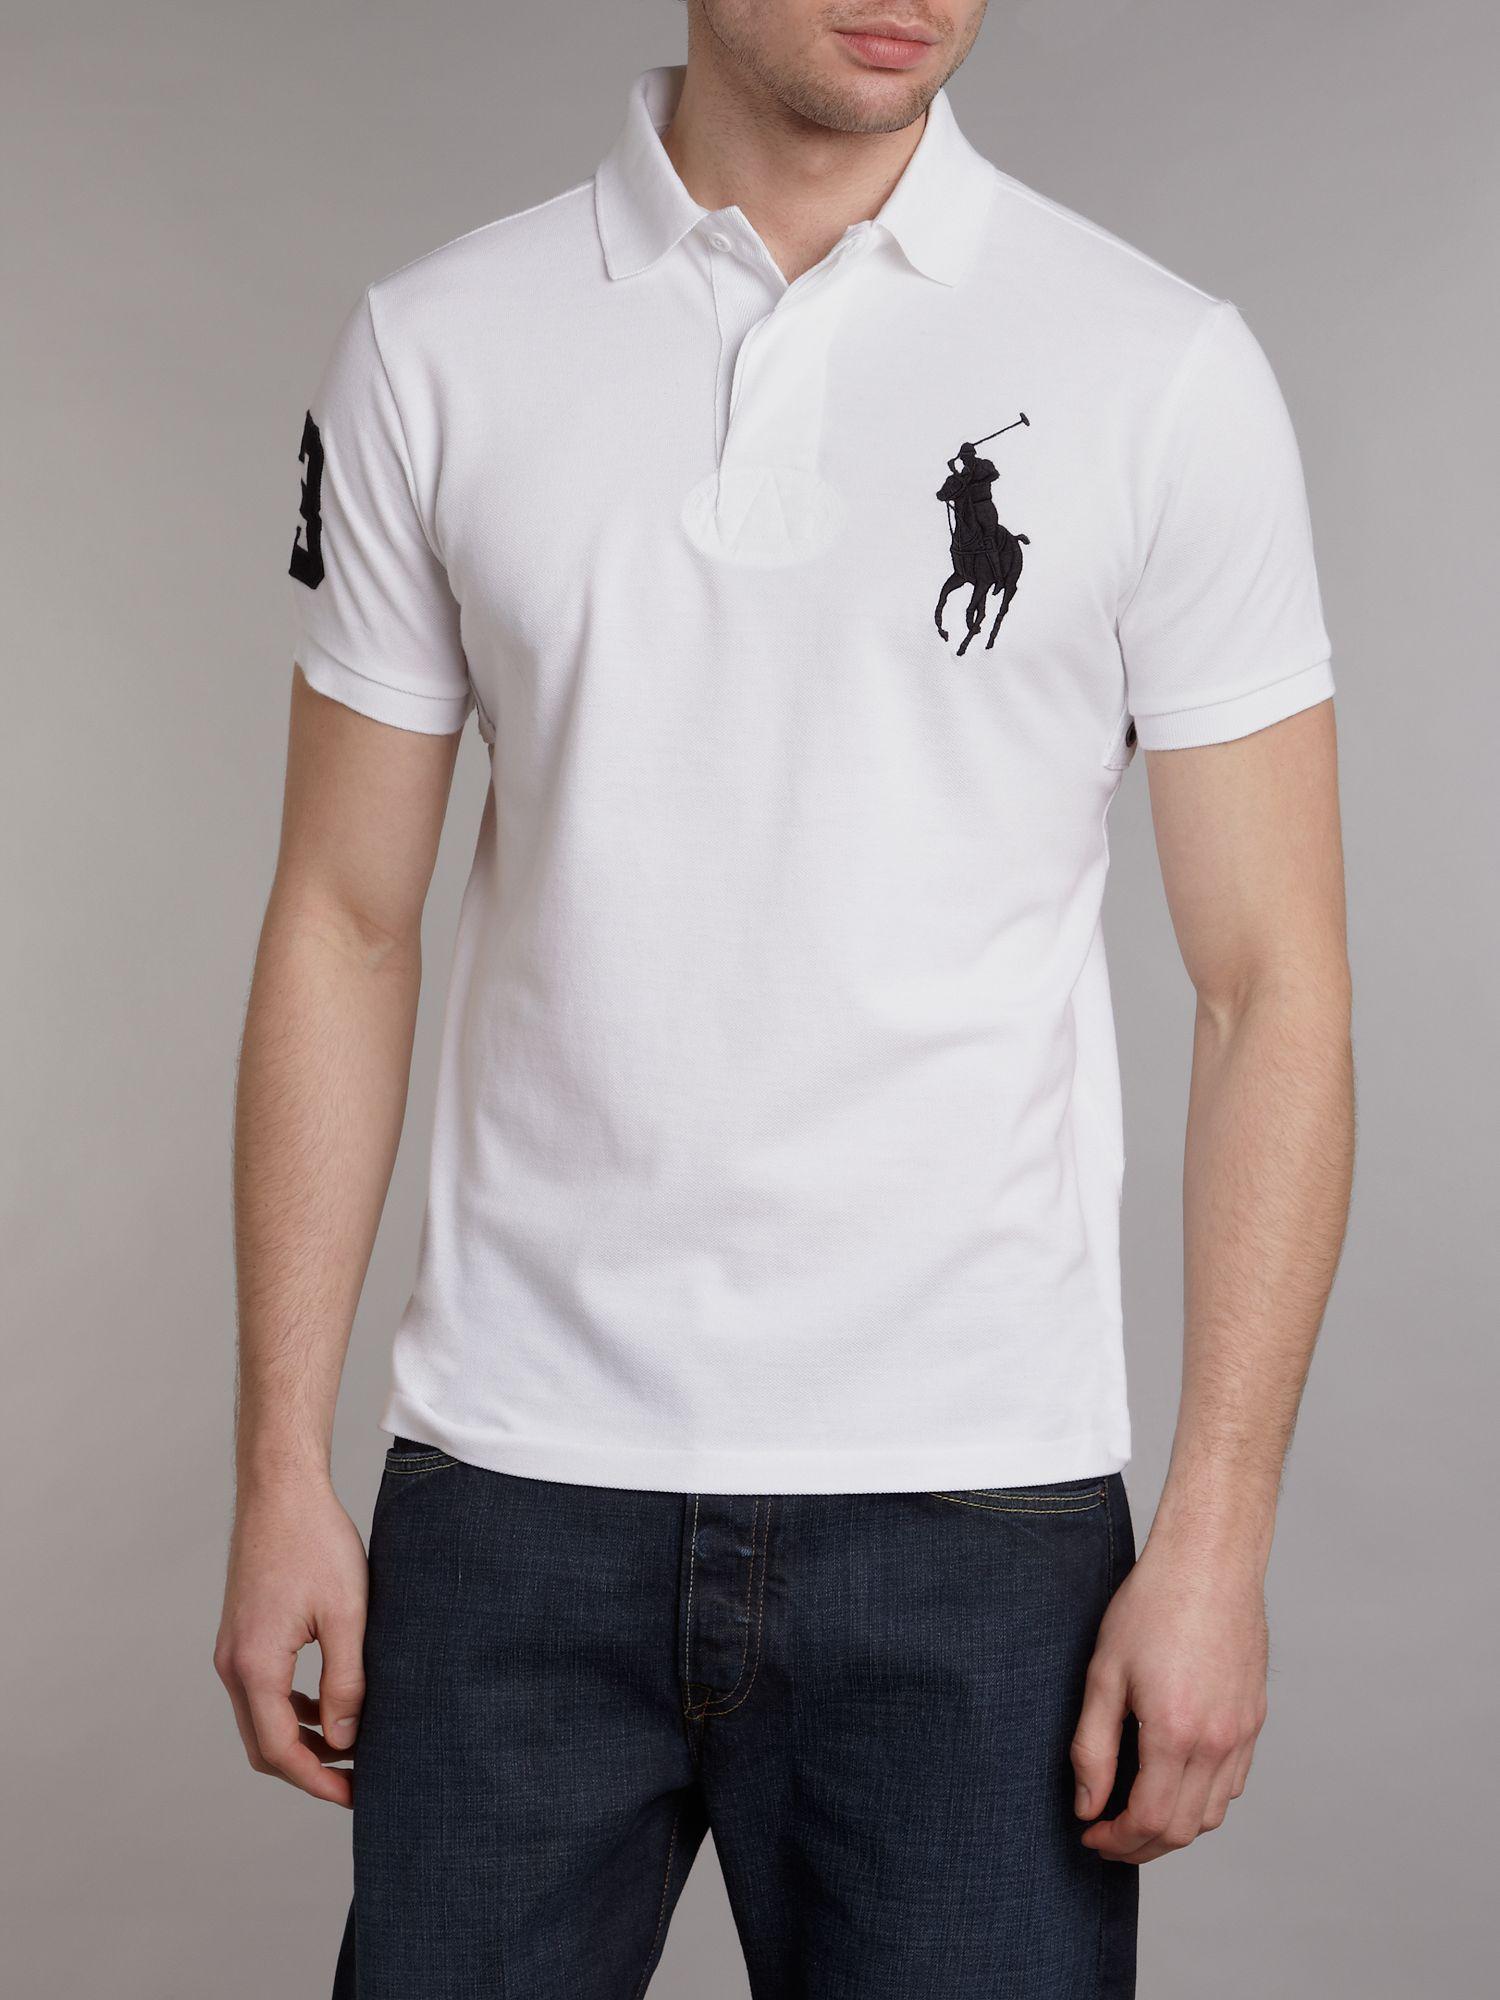 Ralph Lauren Custom Tonal Big Pony White Polo